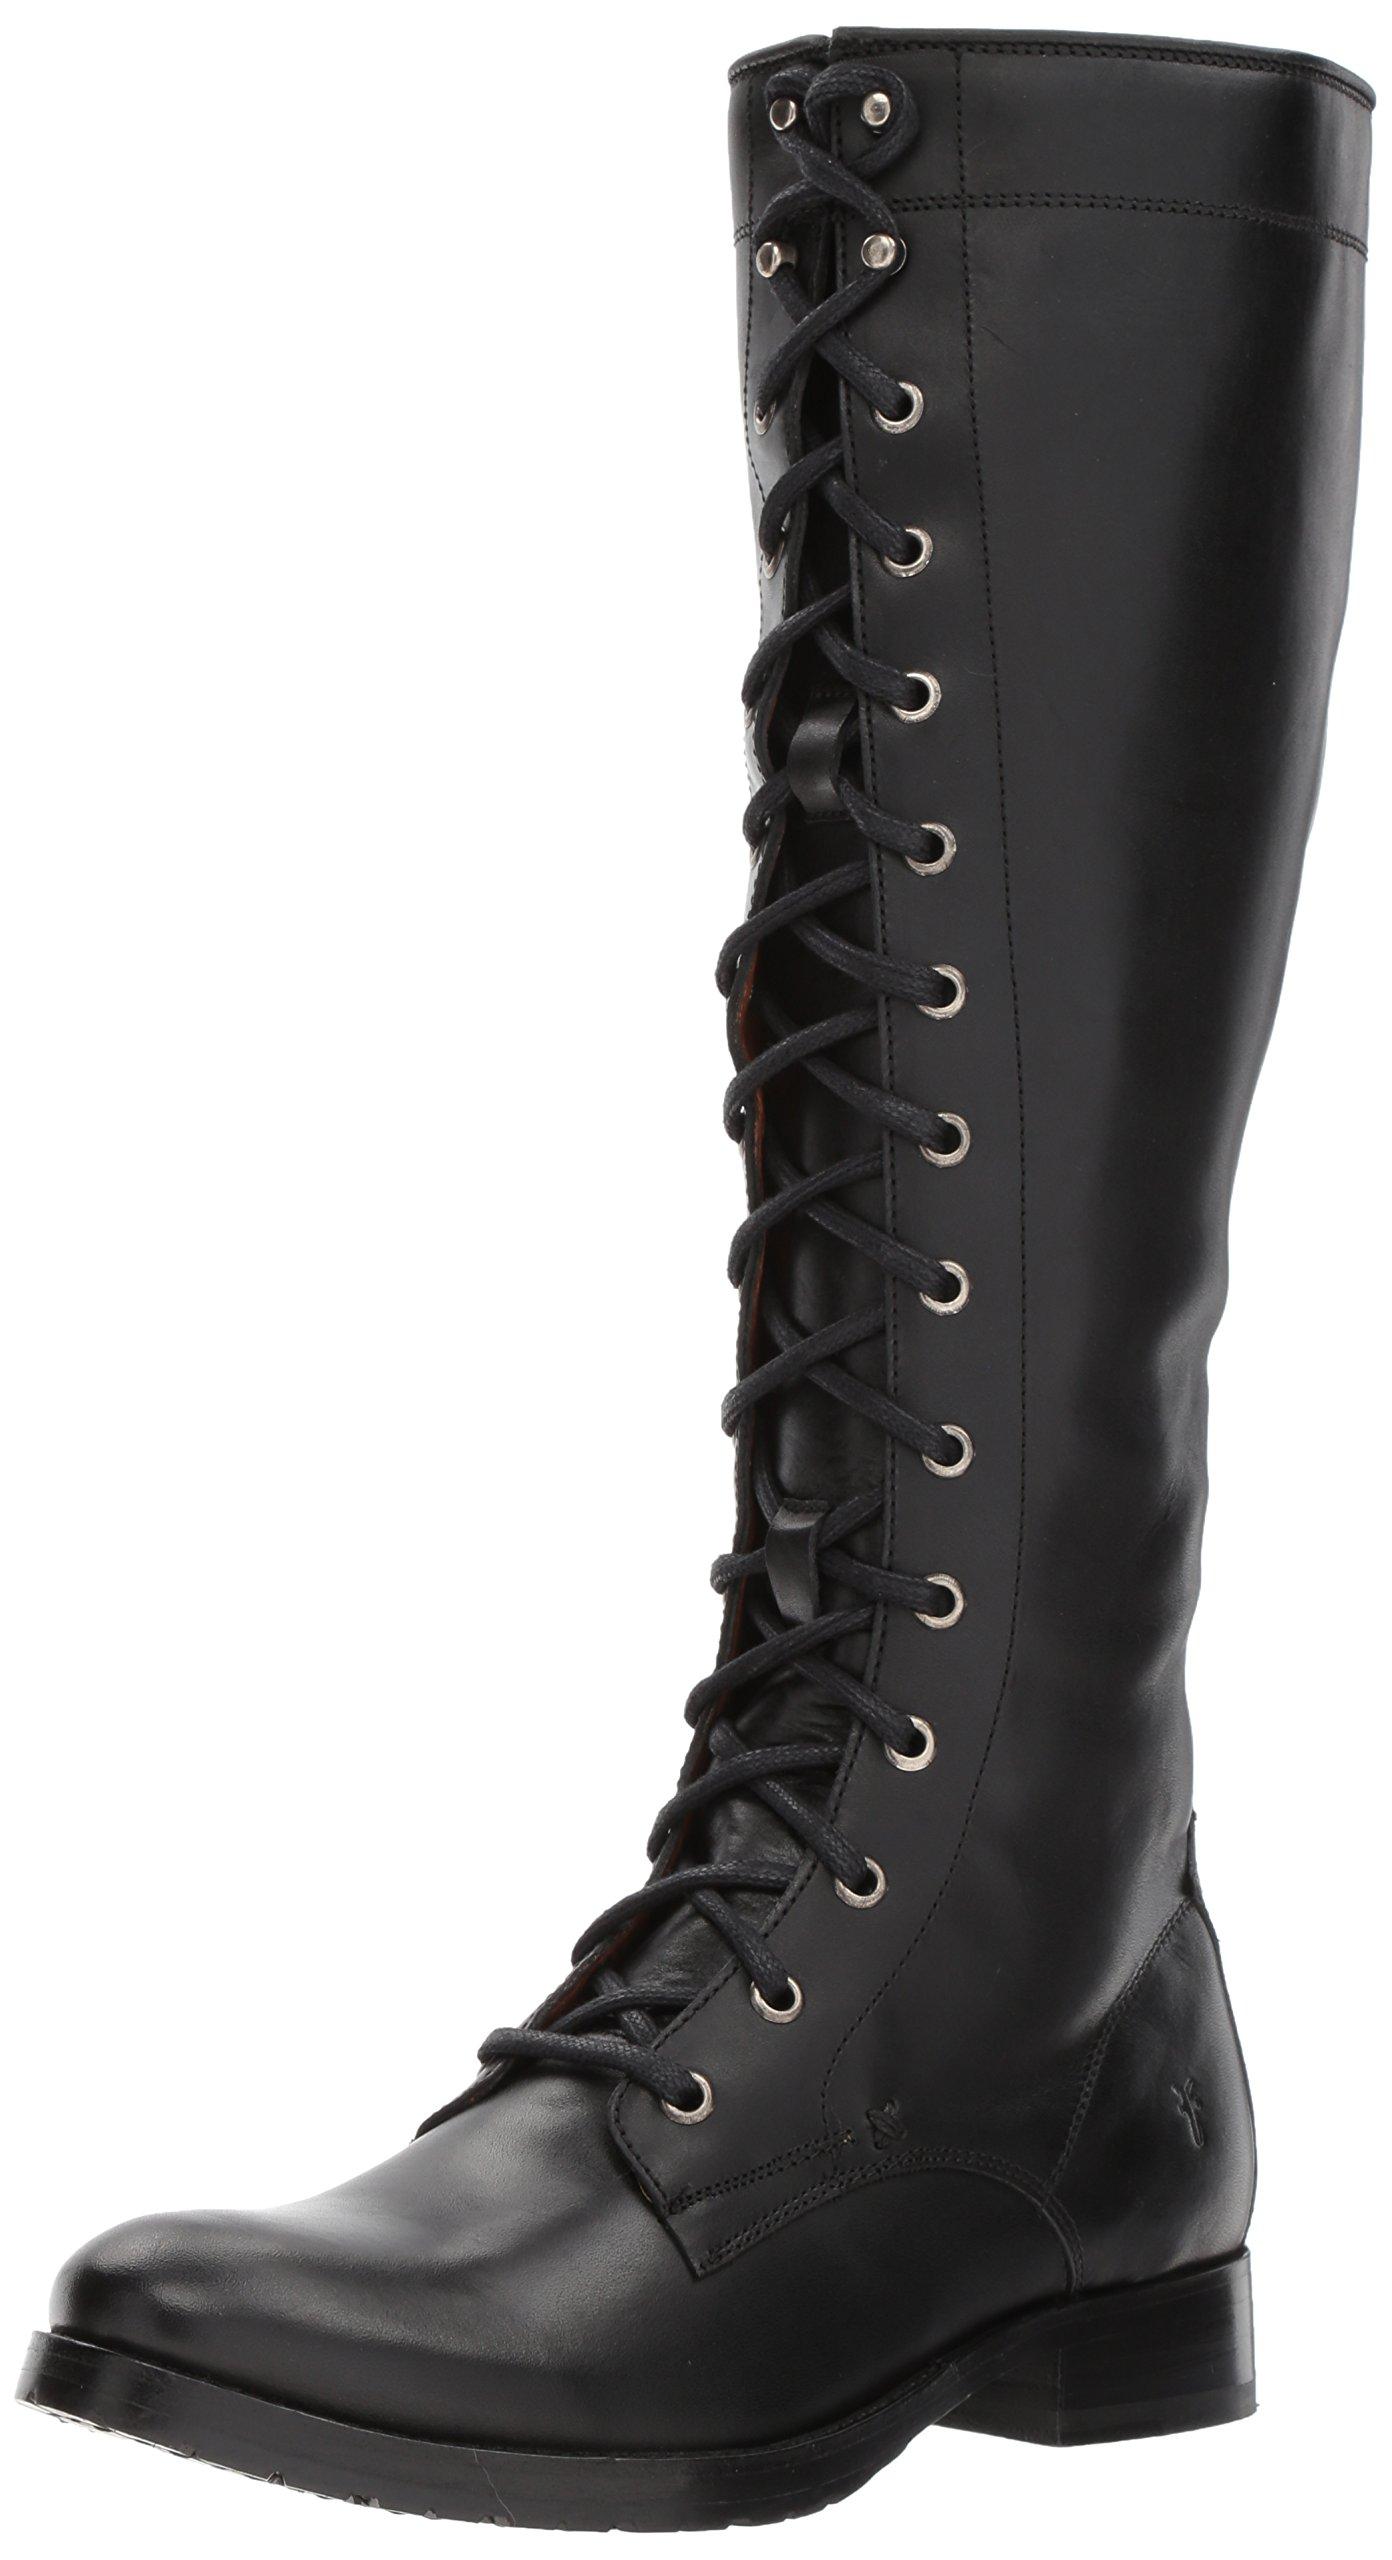 FRYE Women's Melissa Tall Lace Riding Boot, Black, 7 M US